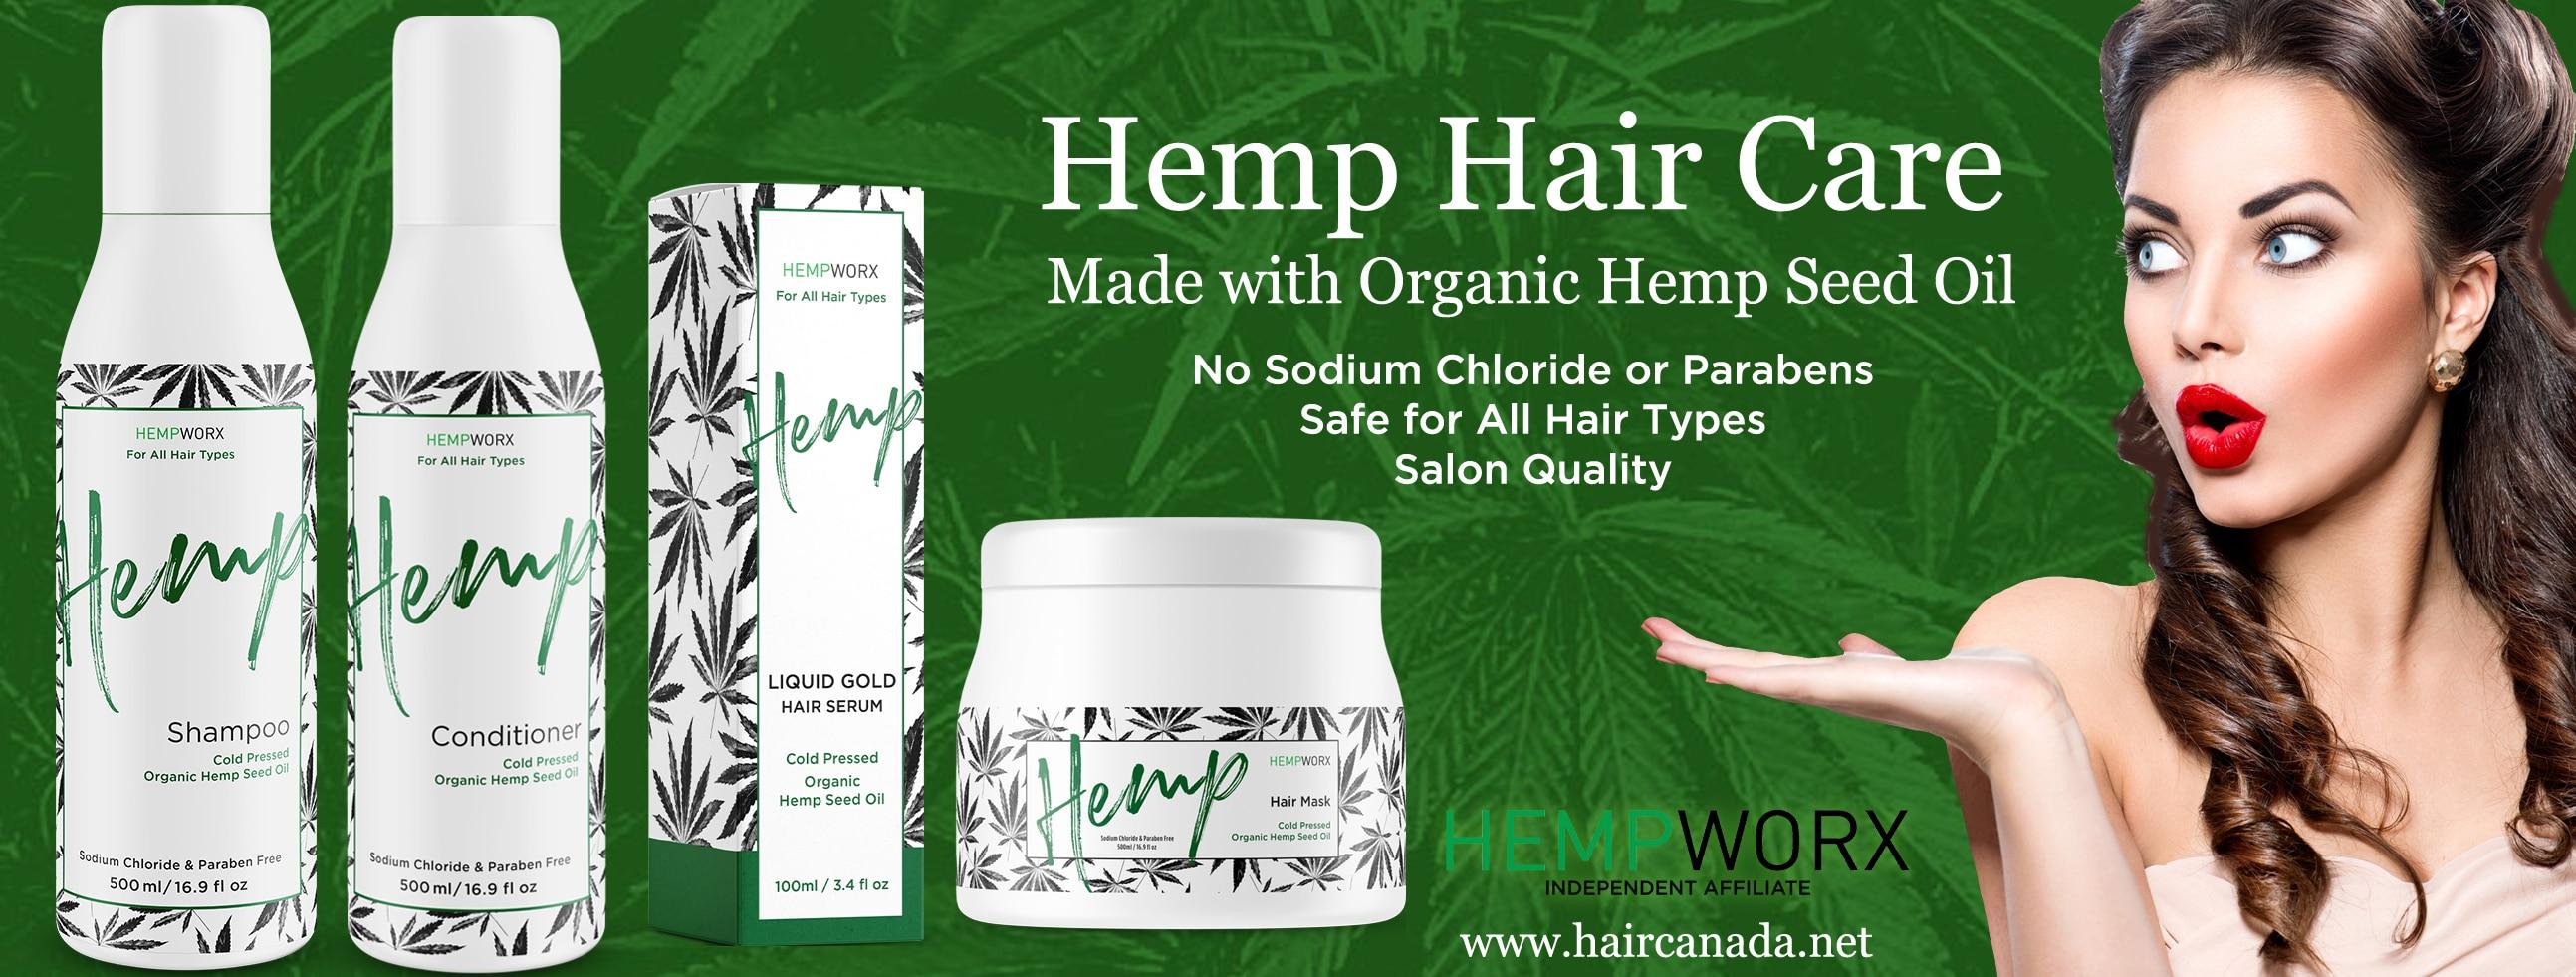 new mlm 2020 hair care hempworx